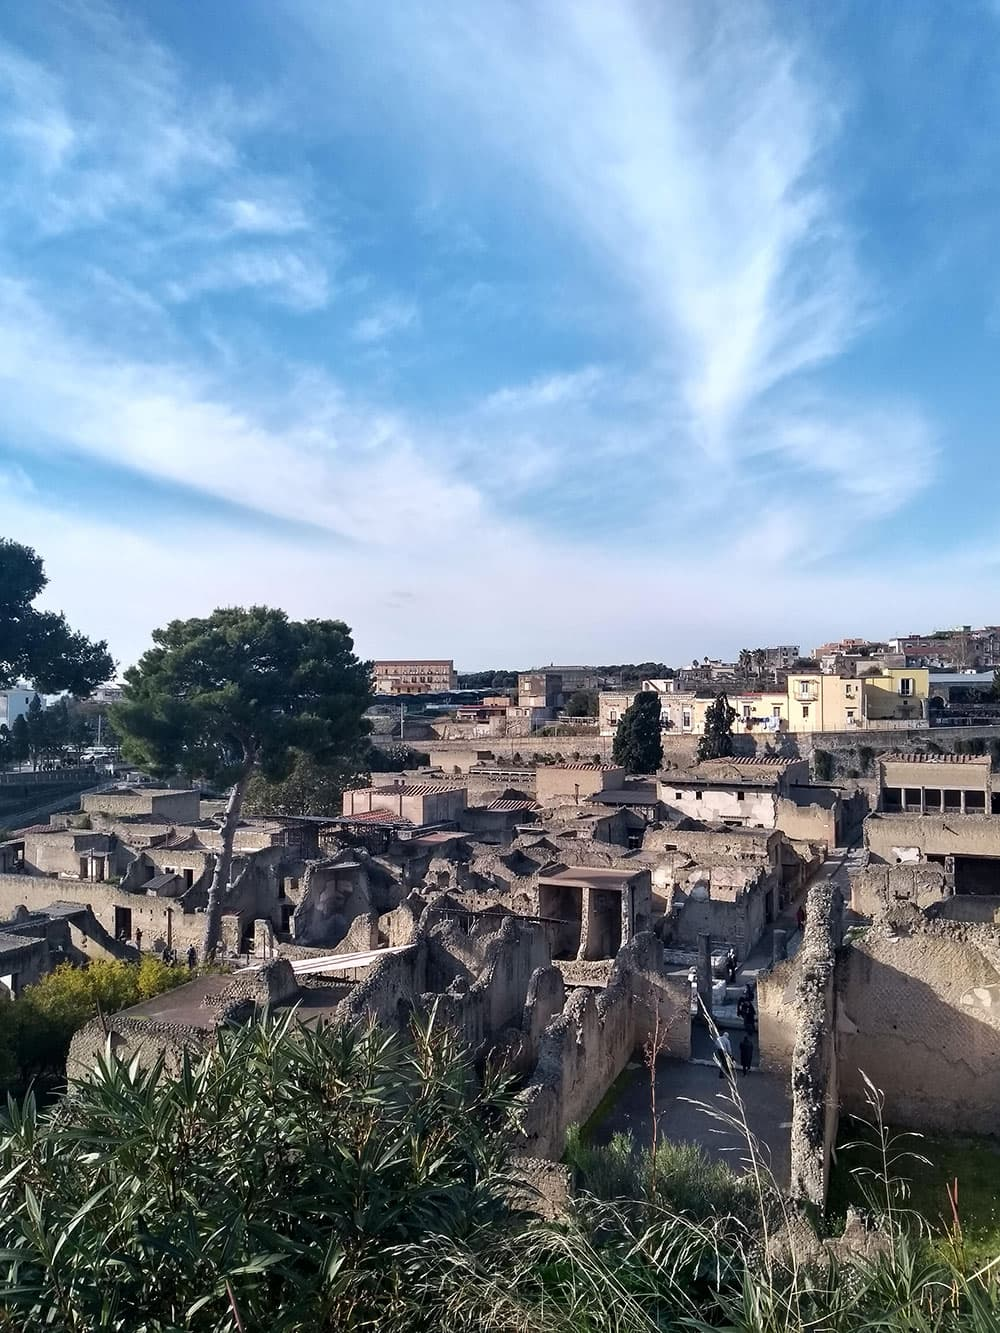 Looking over Herculaneum ruins